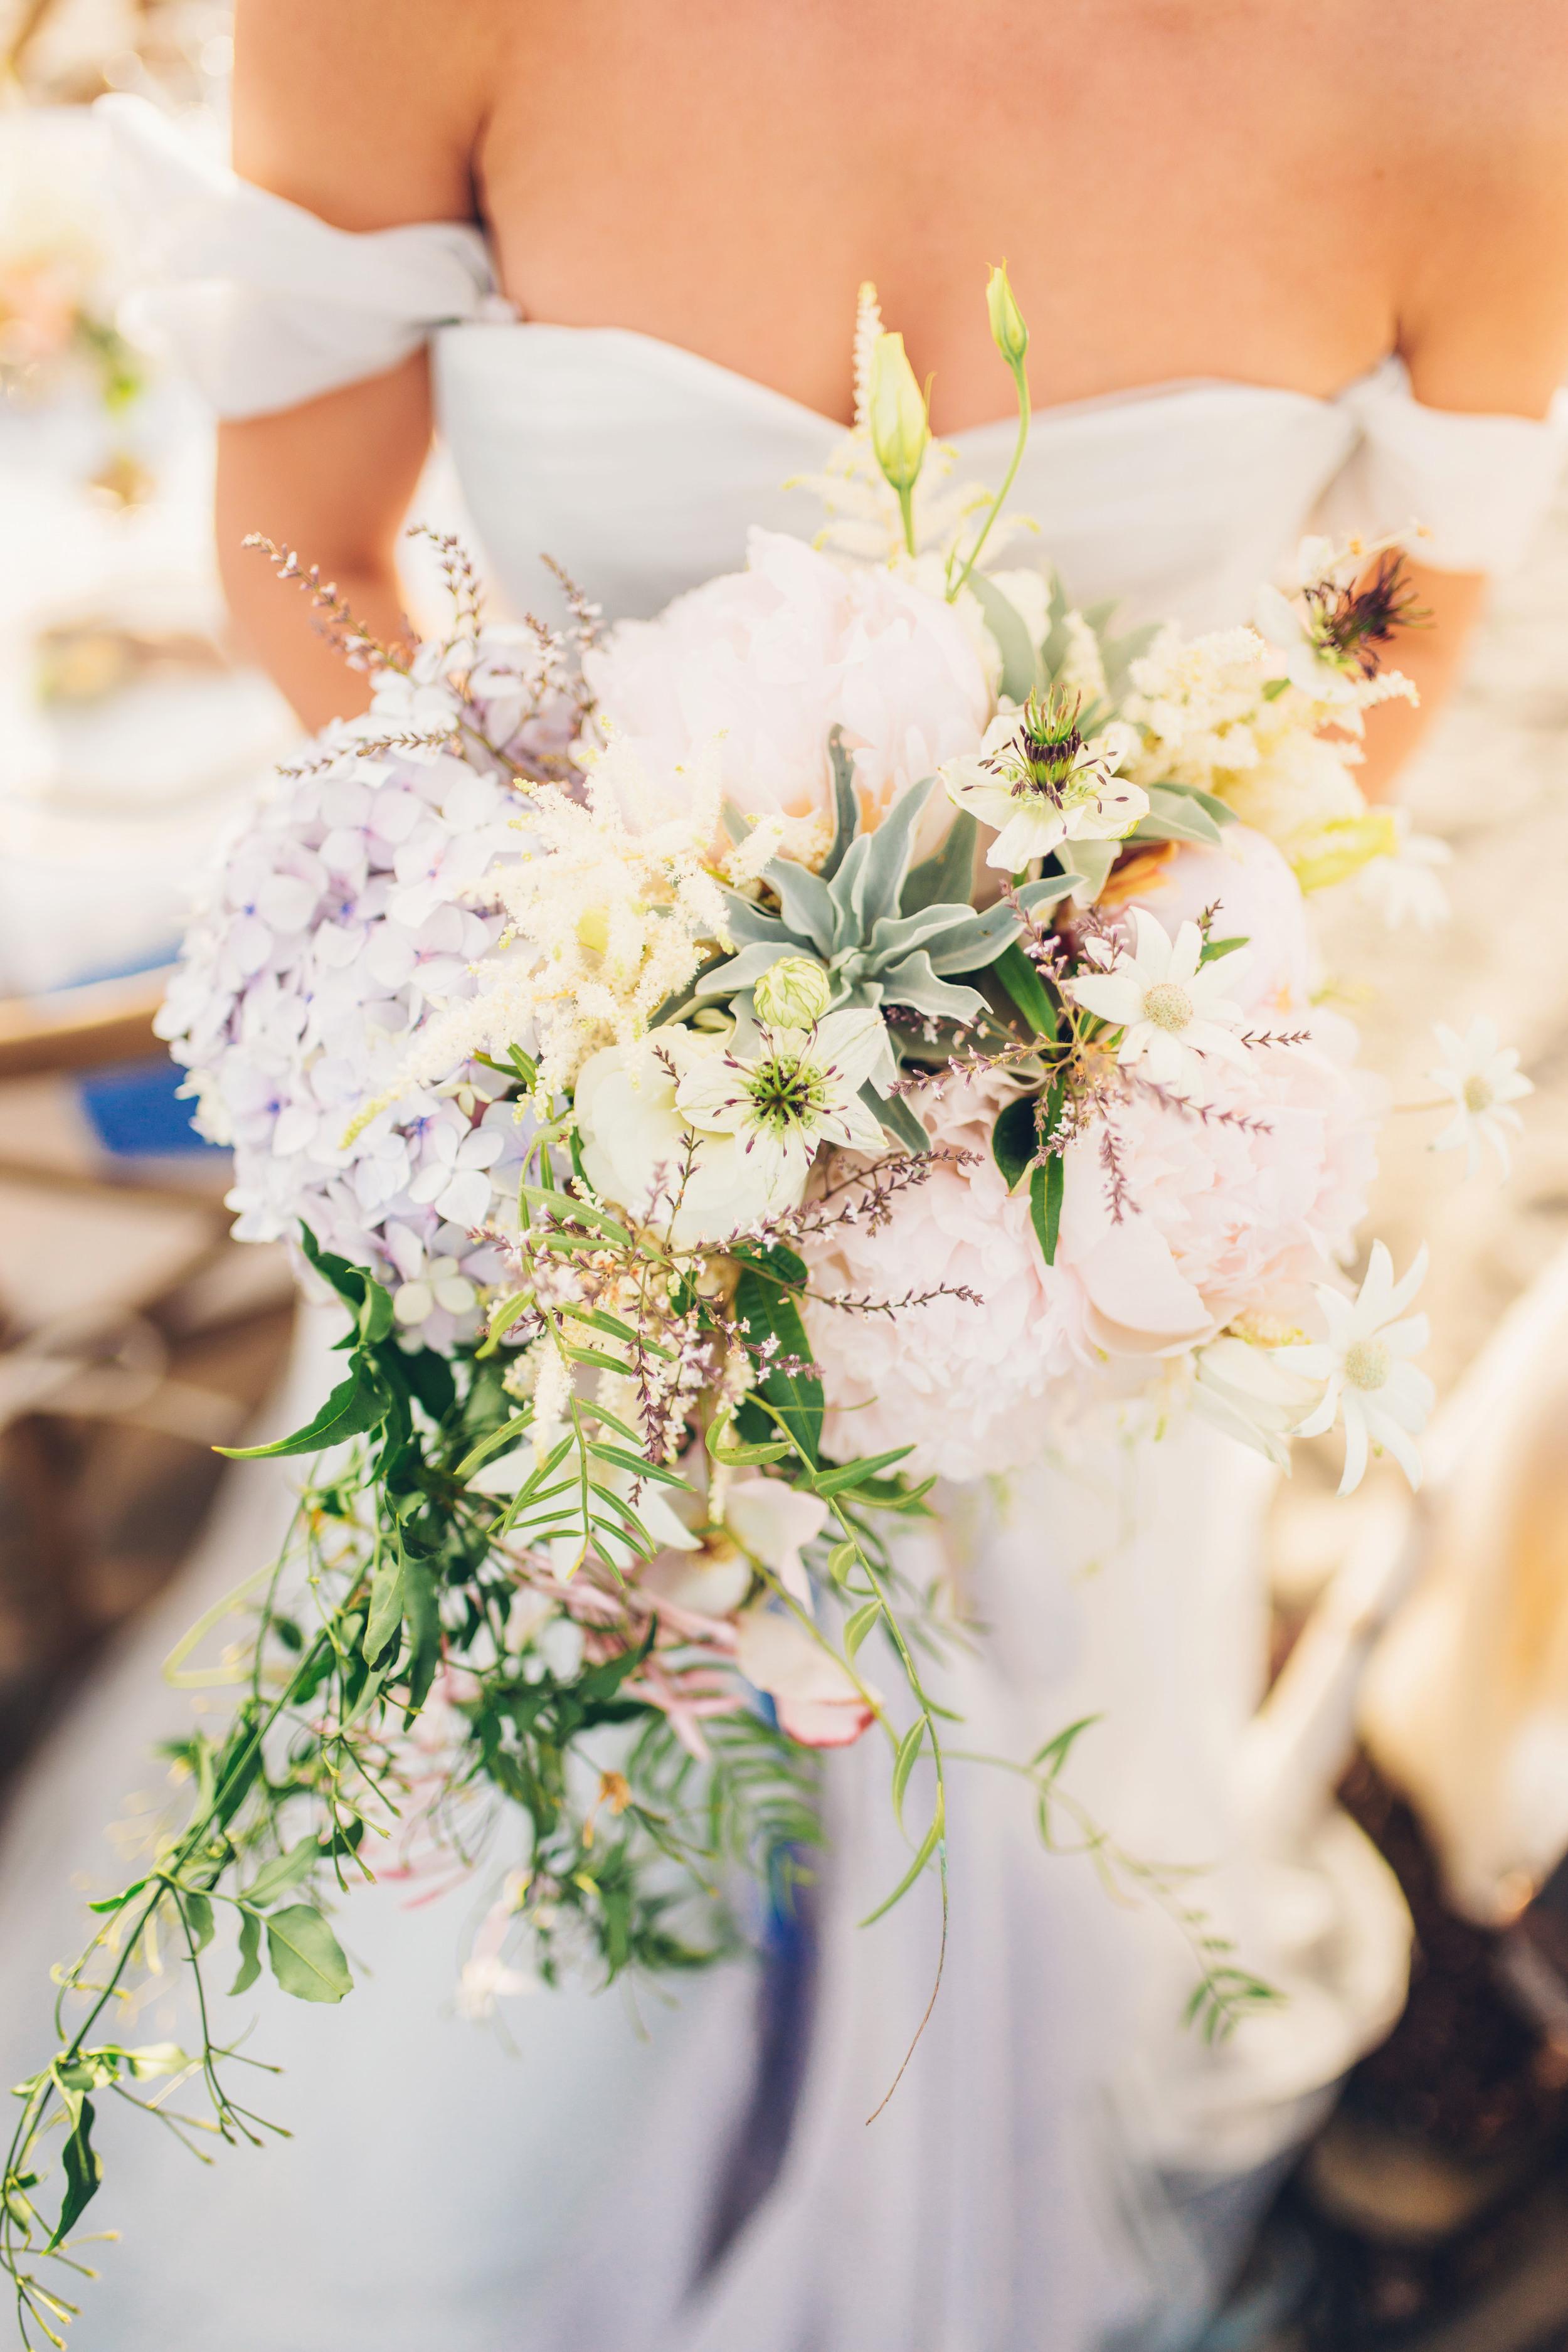 Overflowing bouquet of Peonies, Hydrangeas, and Jasmine